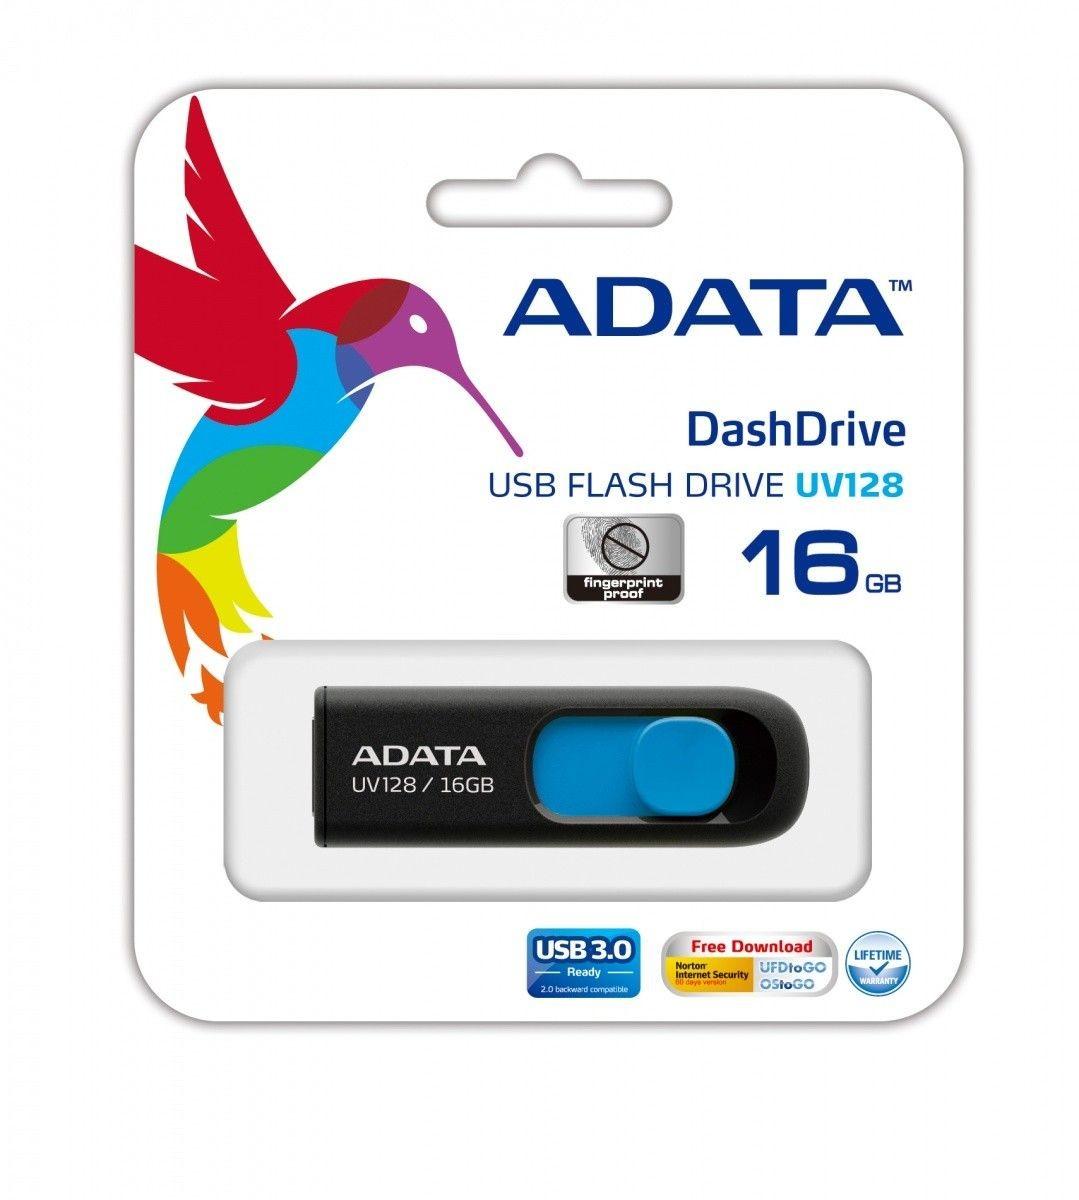 A-Data Adata pamięć USB DashDrive UV128 16GB USB 3.0 Czarny+Niebieski